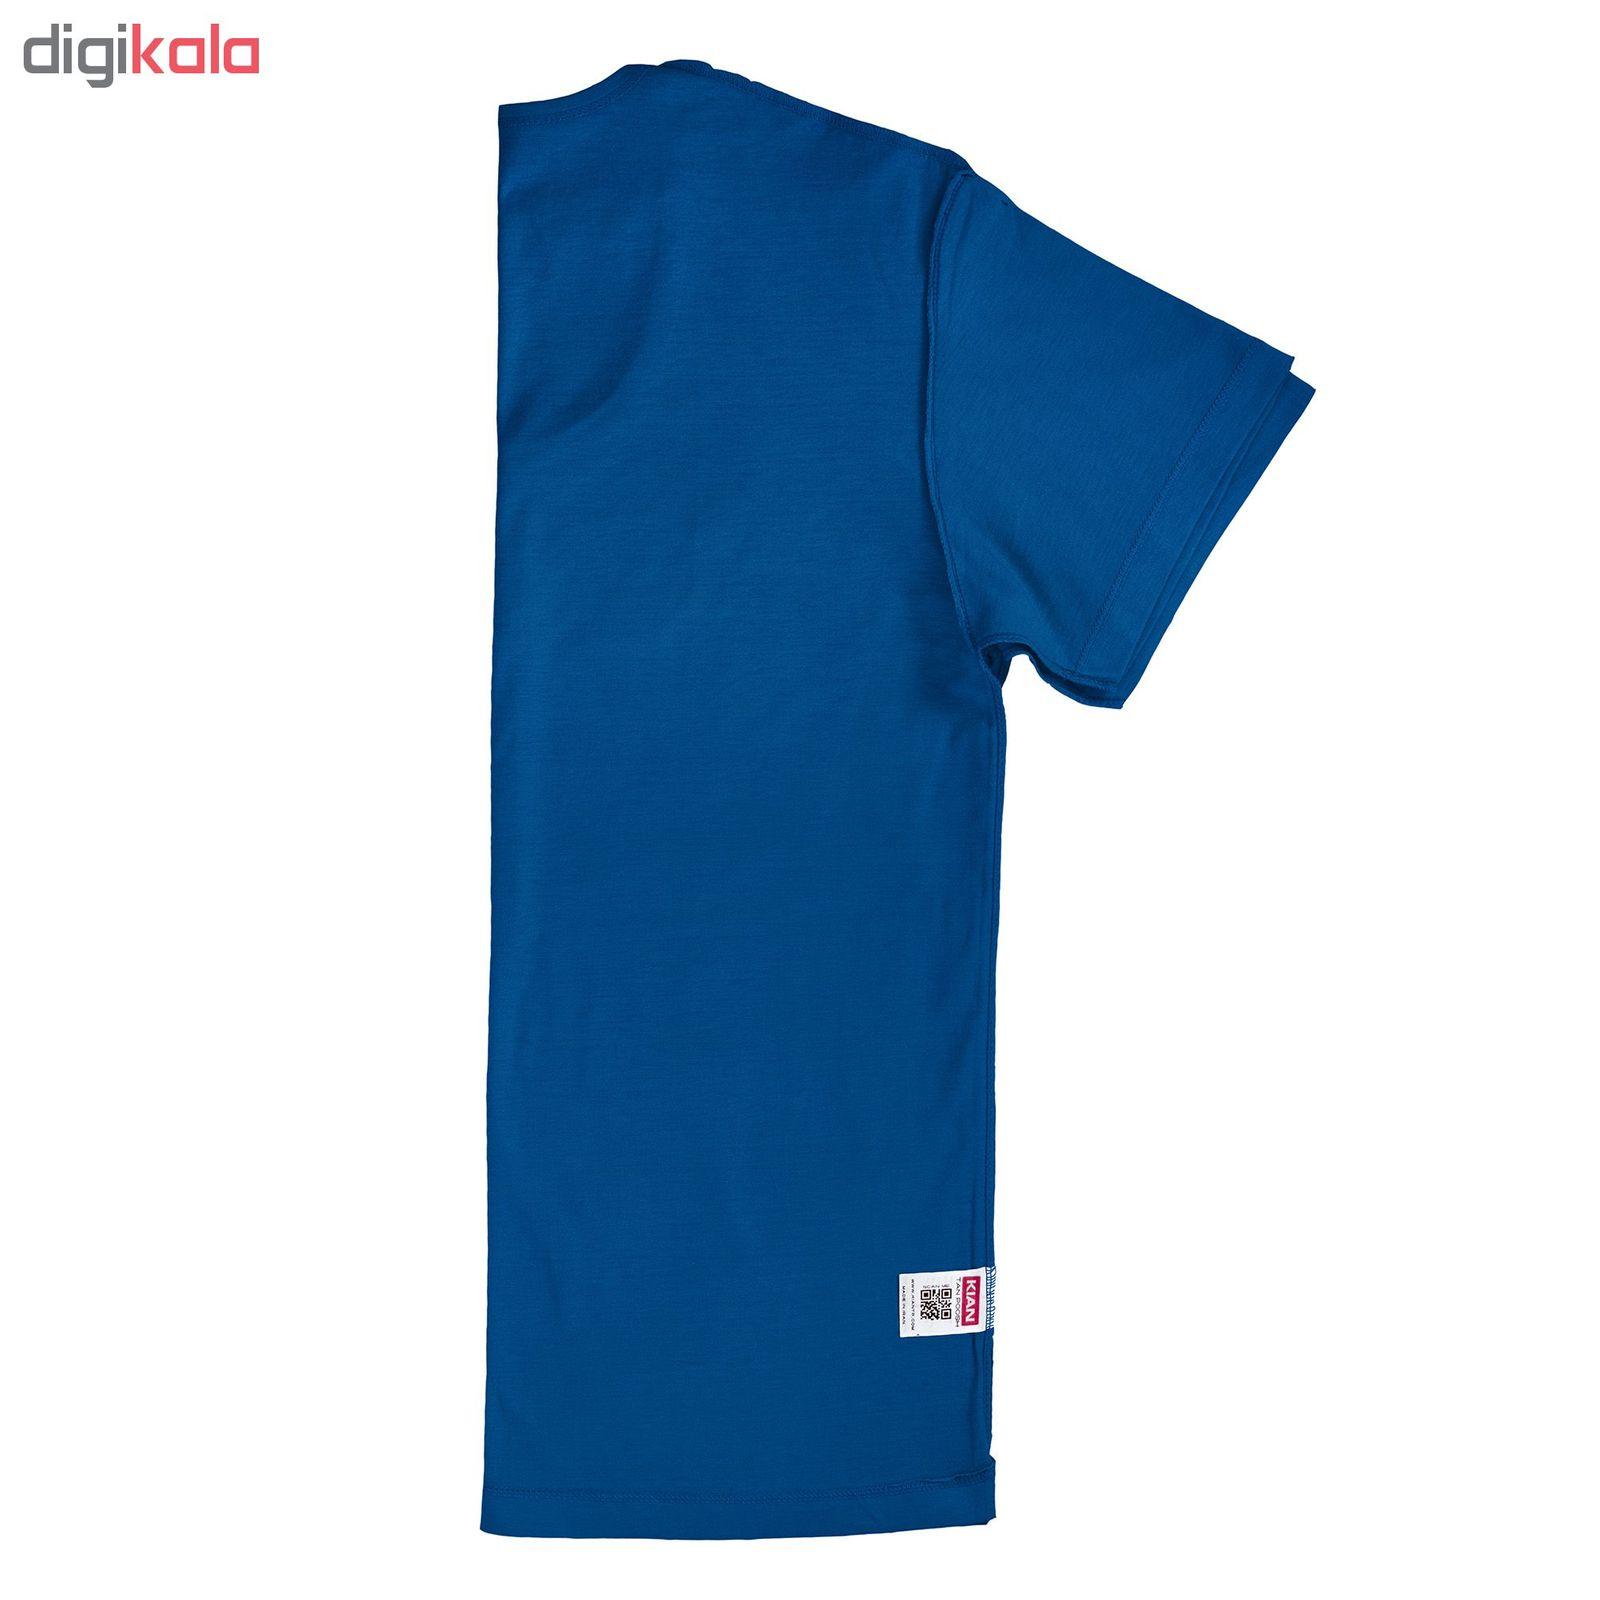 زیرپوش مردانه کیان تن پوش مدل U Neck Shirt Classic BC main 1 3